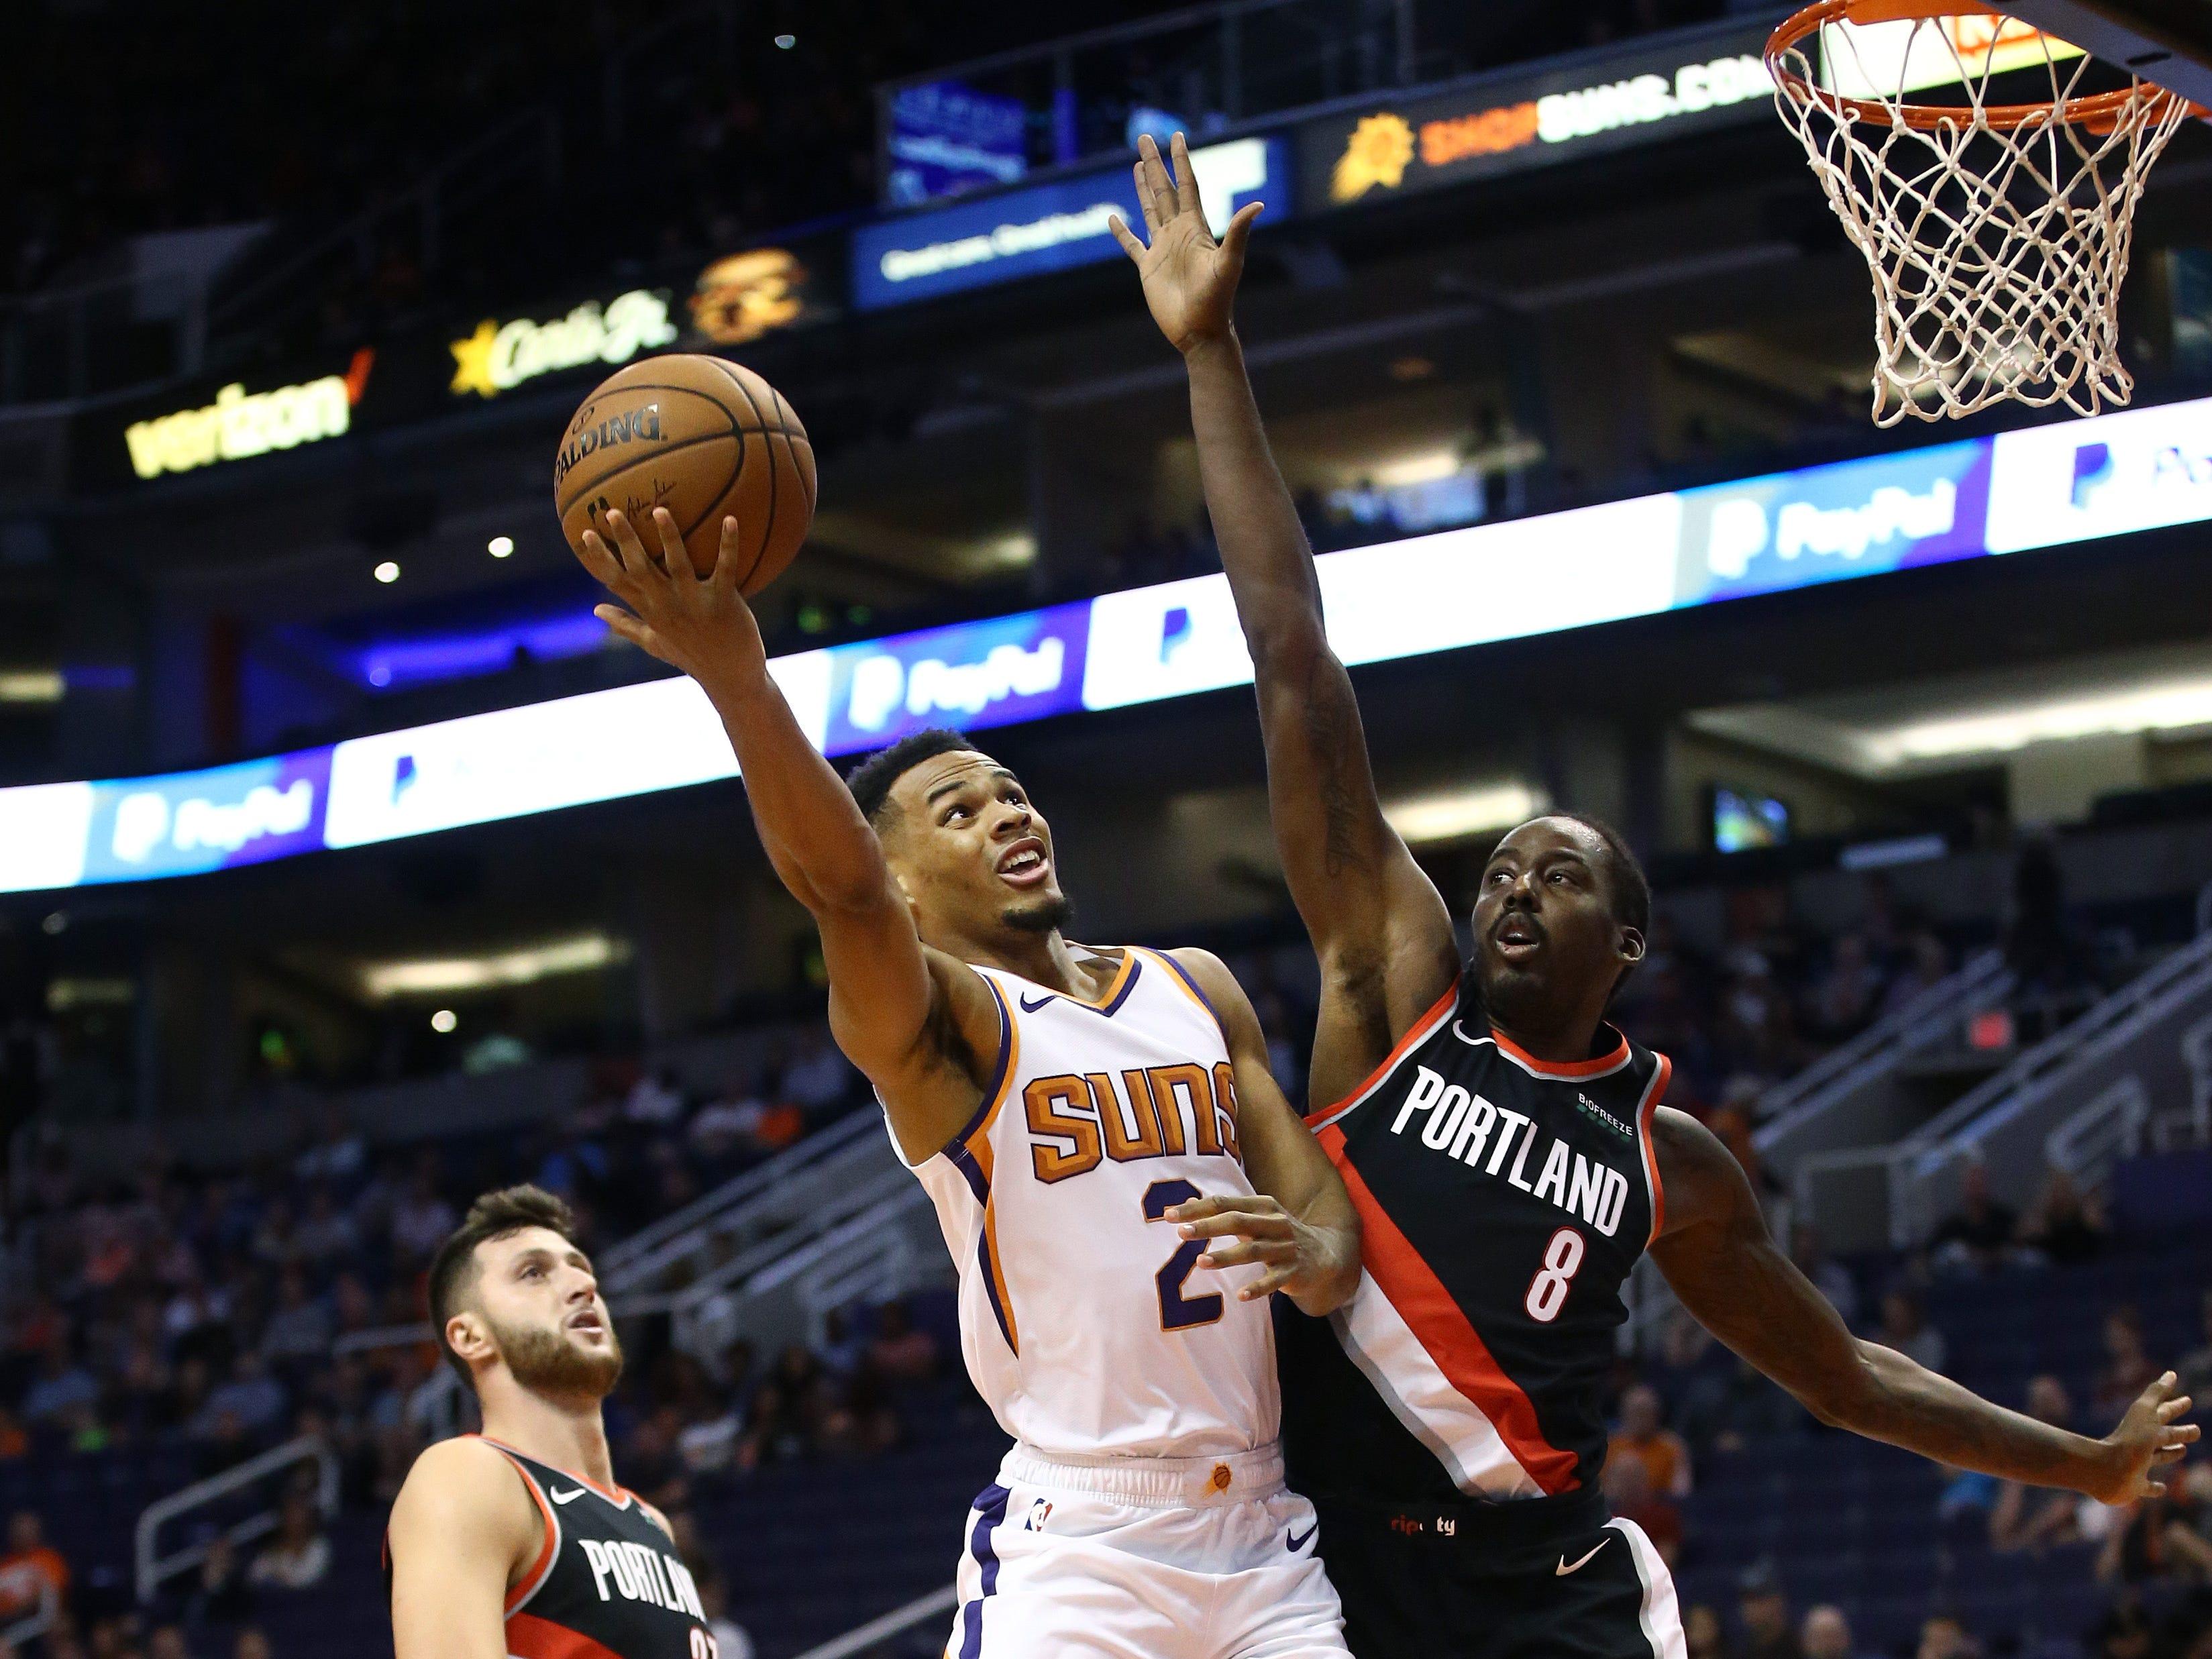 Phoenix Suns guard Elie Okobo drives to the basket against Portland Trail Blazers forward Al-Farouq Aminu during a preseason game at Talking Stick Resort Arena on Oct. 5, 2018, in Phoenix, Ariz.